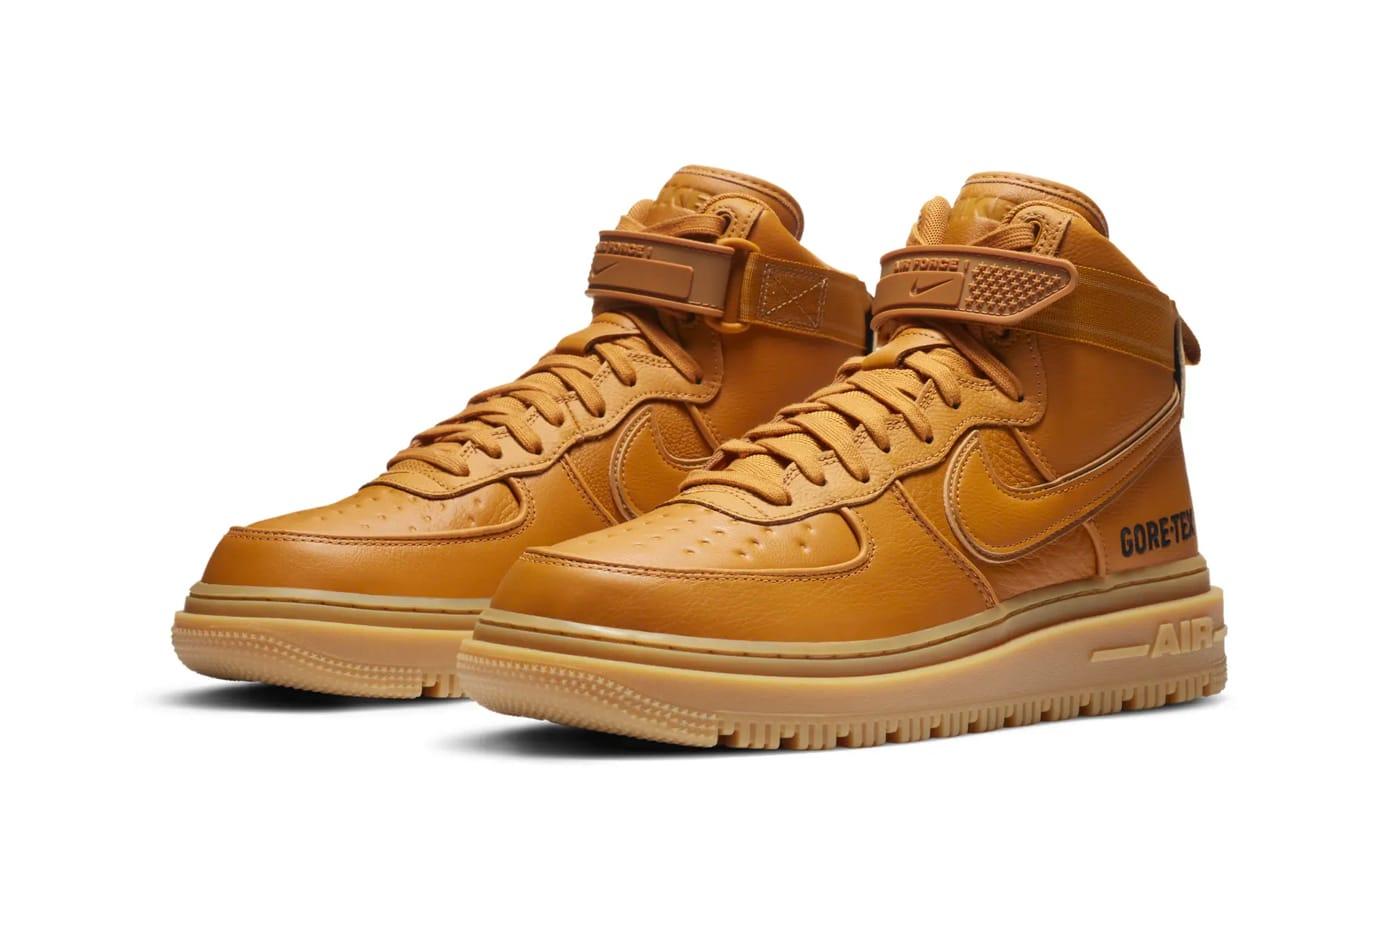 Nike Air Force 1 Boot GORE-TEX \